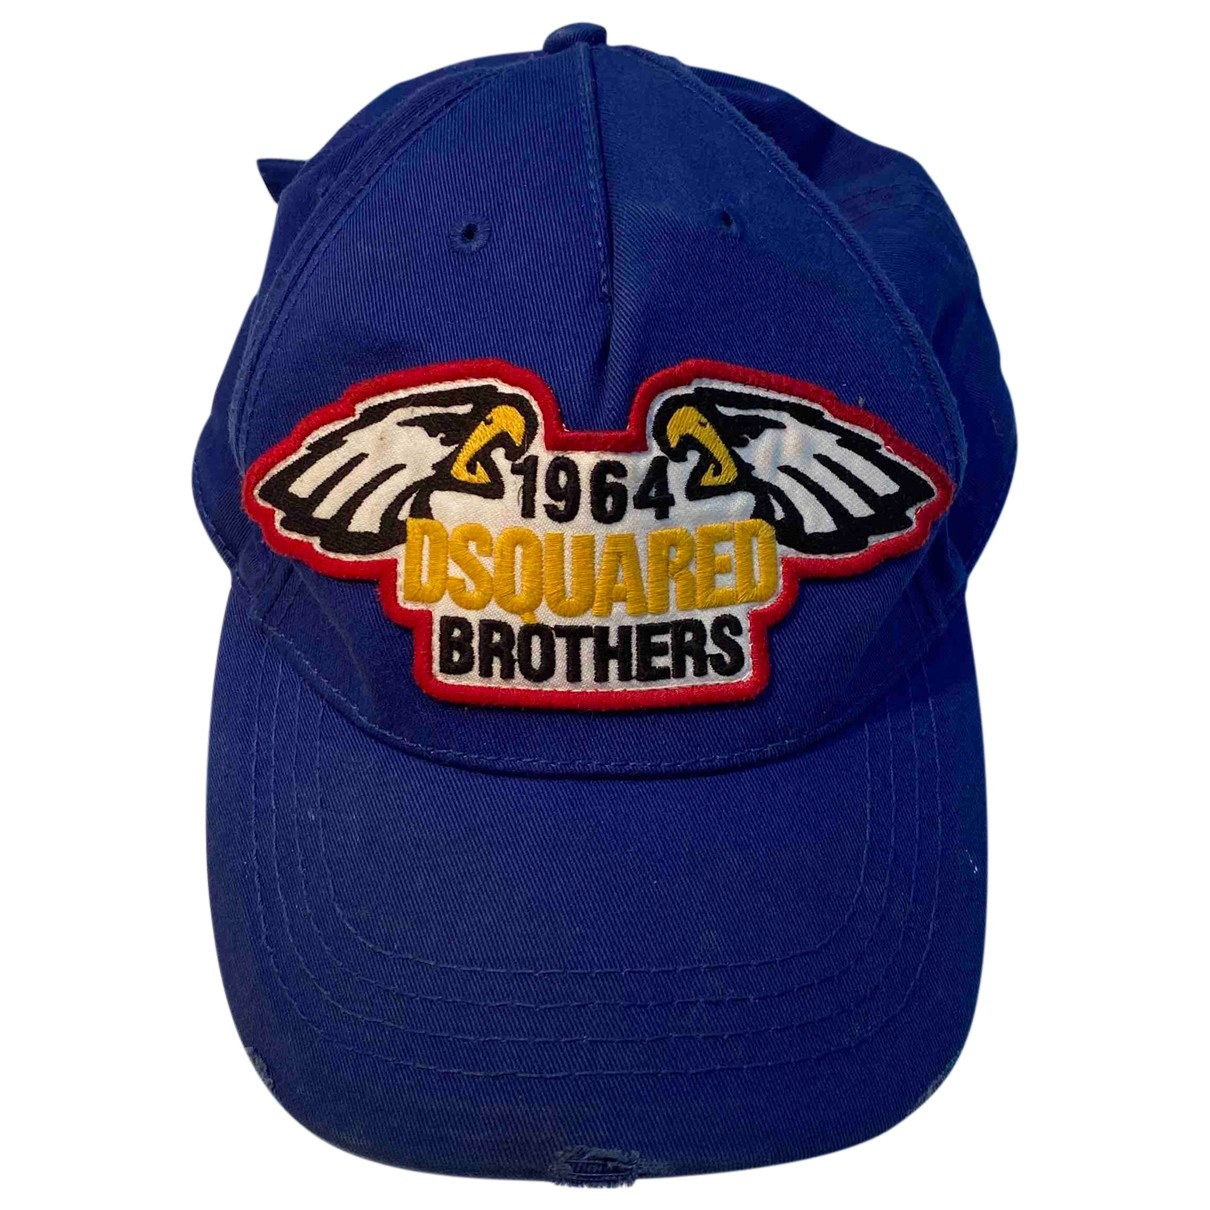 Dsquared2 \N Blue Cotton hat for Women M International